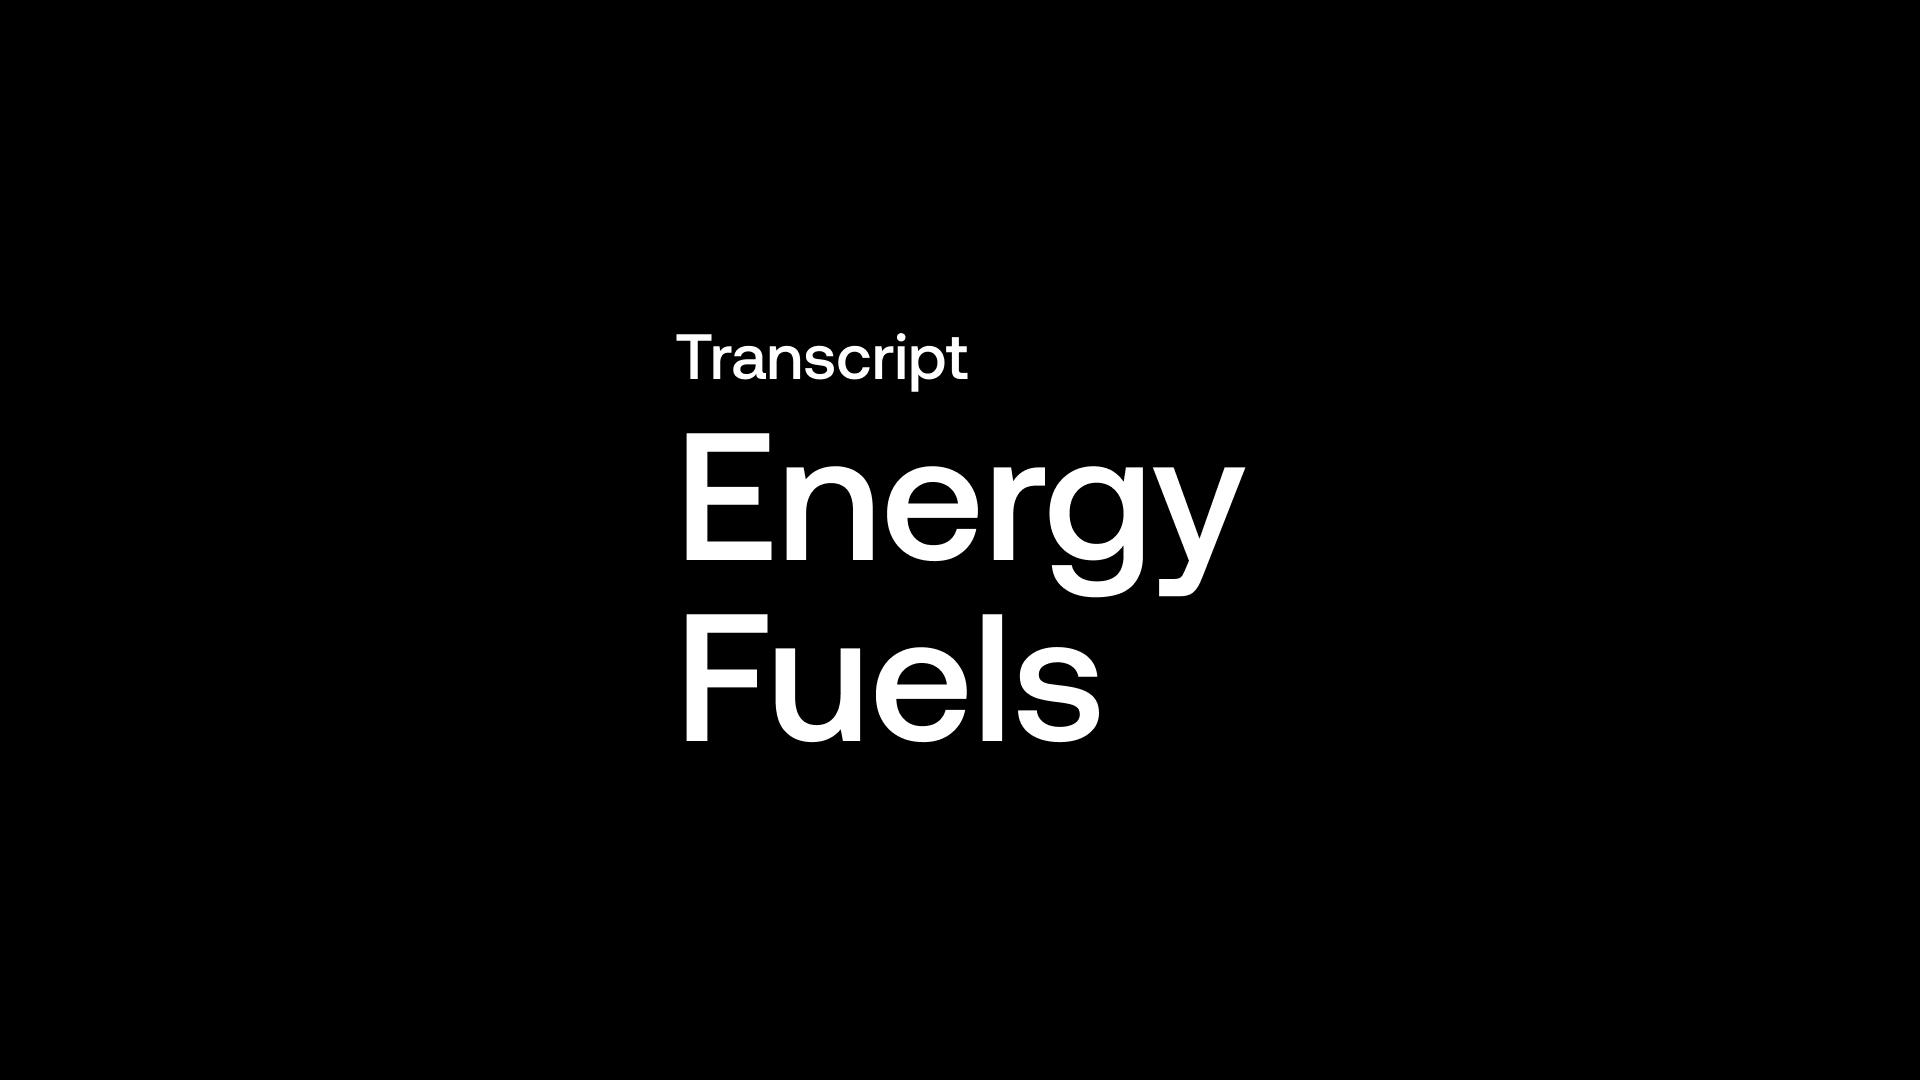 Transcript: Energy Fuels (UUUU) - Uranium Producer Working with US Dept of Energy